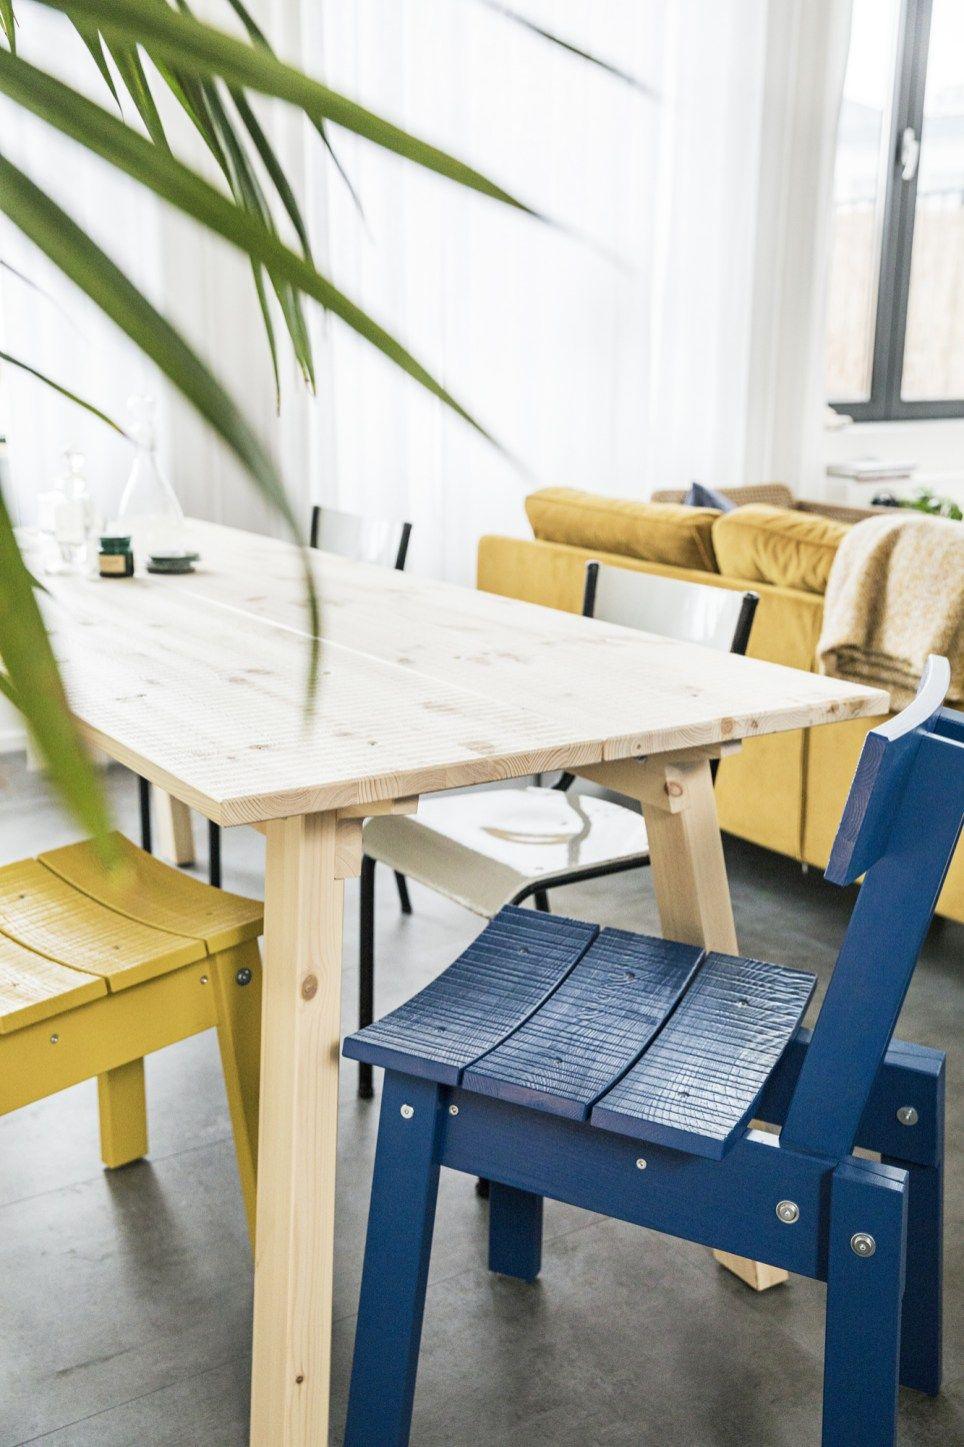 Collection Hjartelig Ikea Mobilier De Salon Decoration Interieure Decoration Interieure Et Exterieure